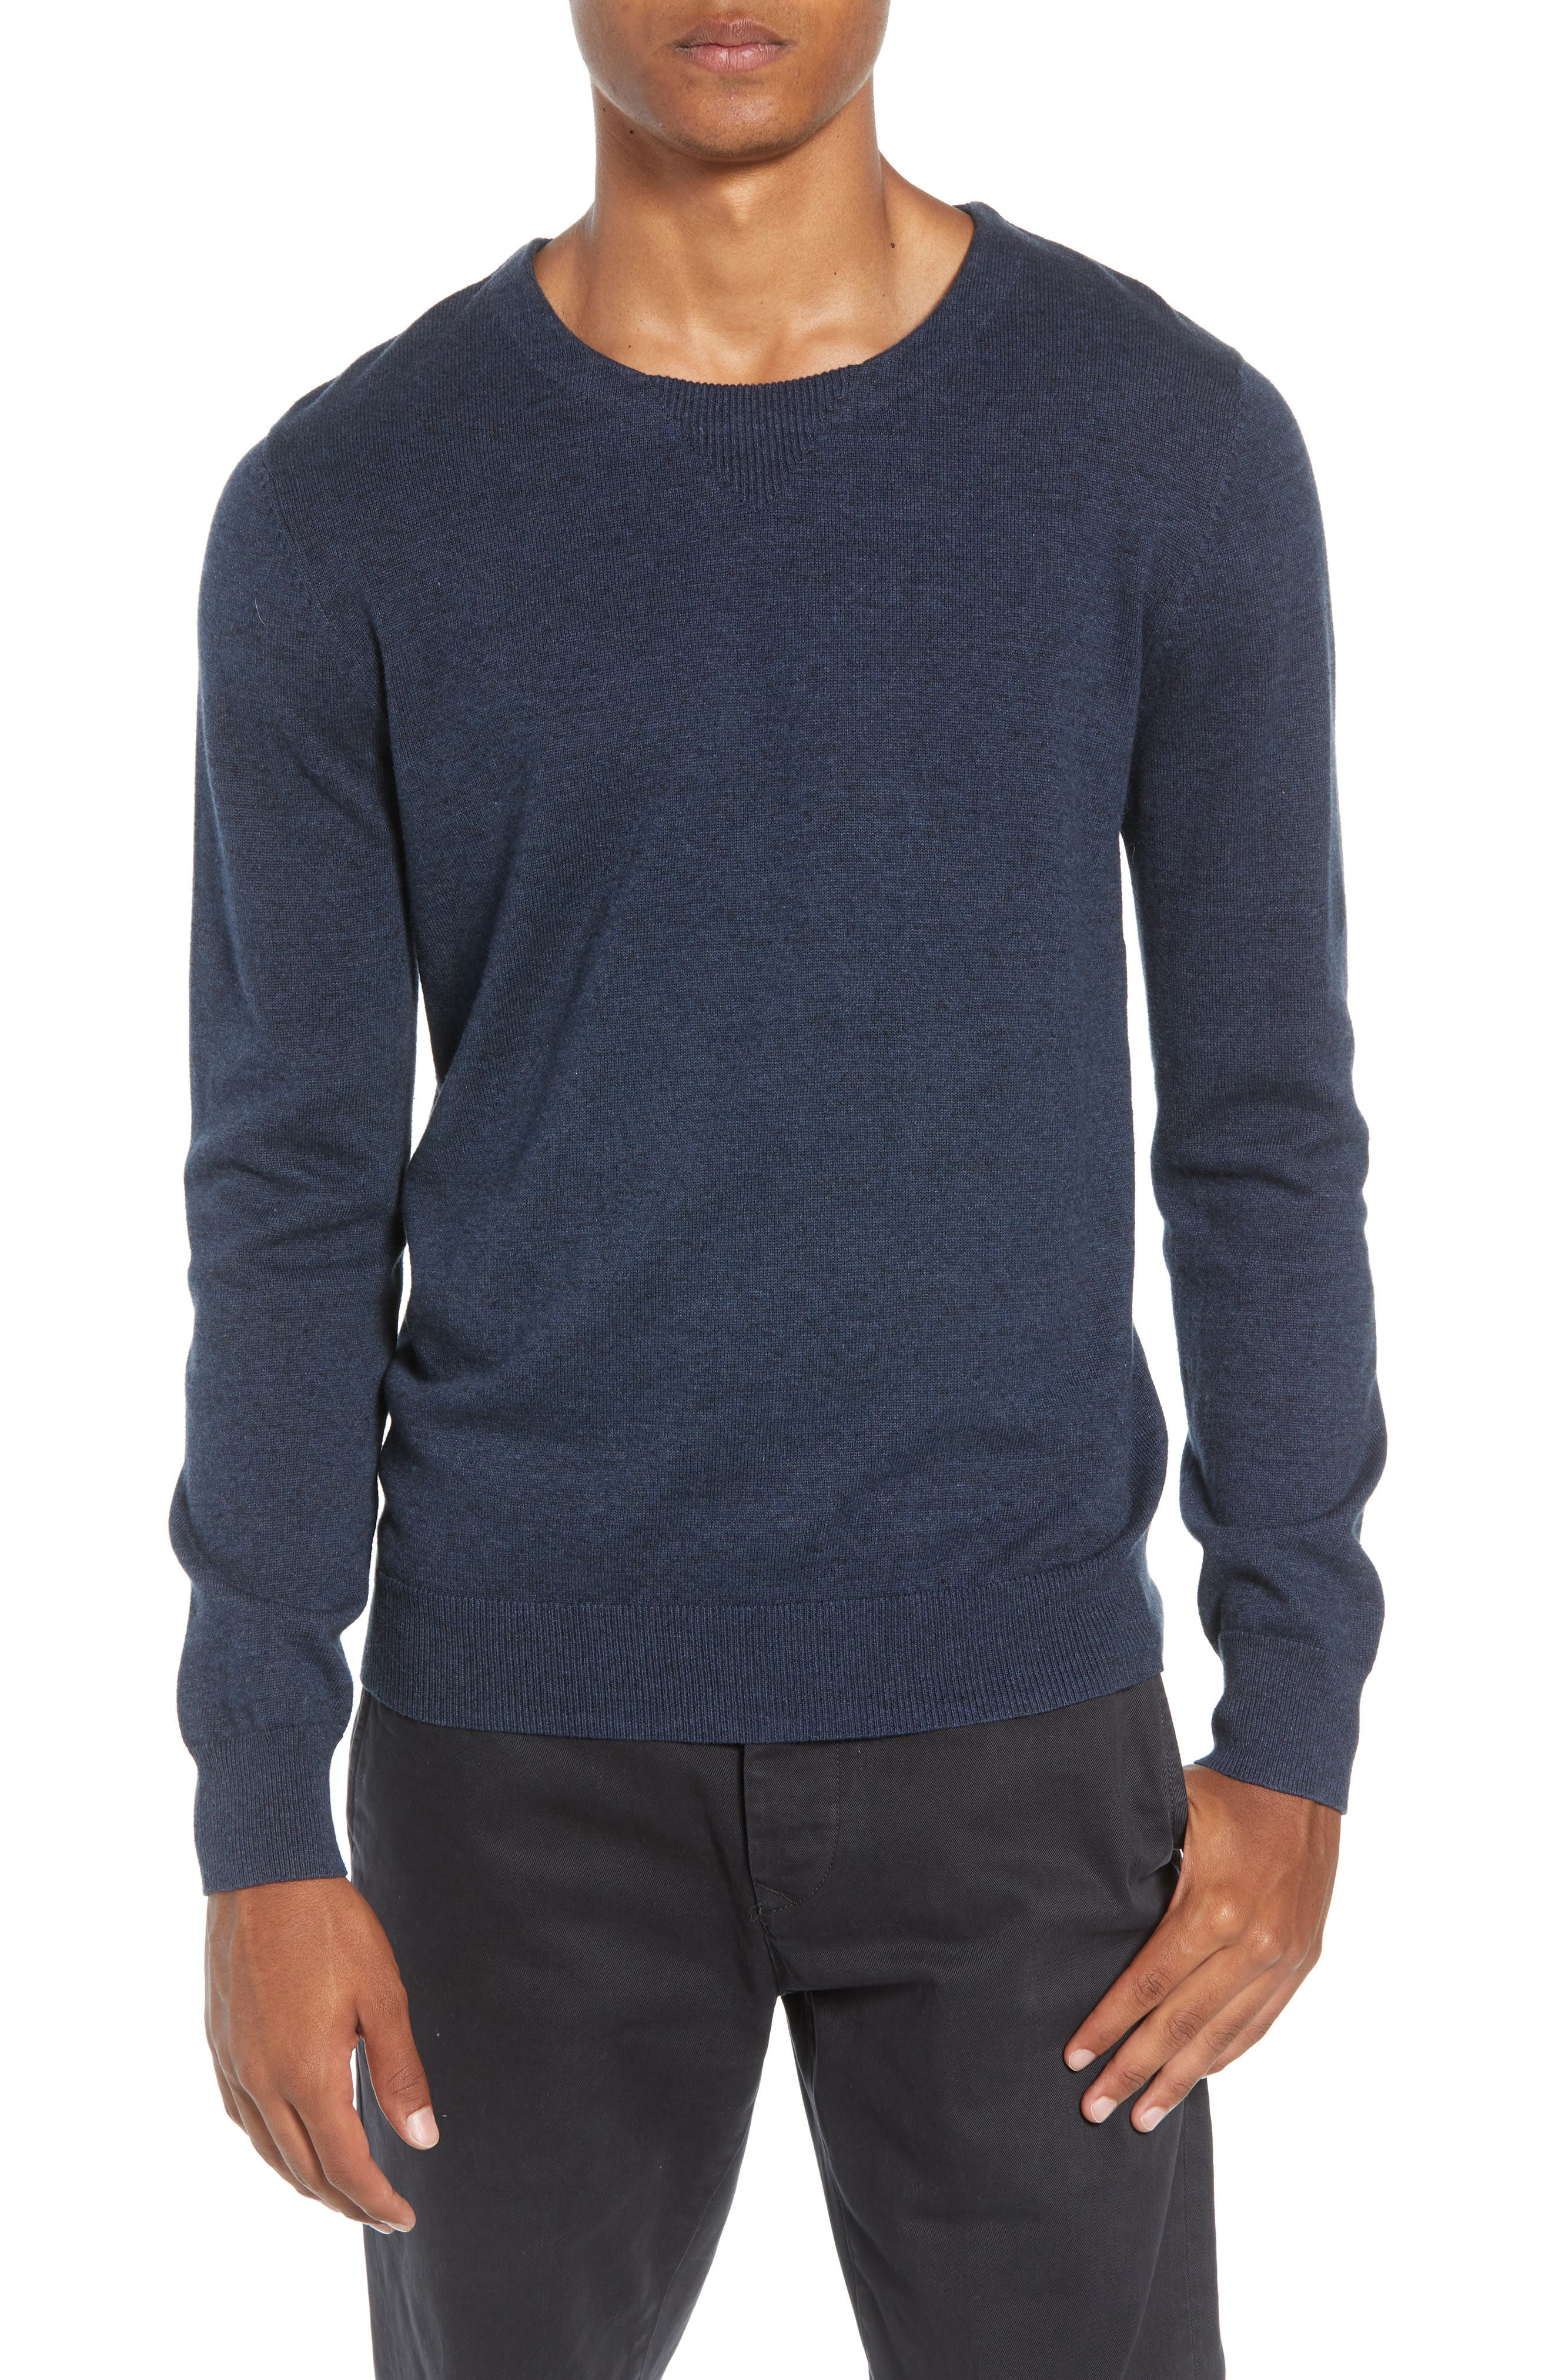 McGill Slim Fit Crewneck Sweater,                             Main thumbnail 1, color,                             HEATHER NAVY